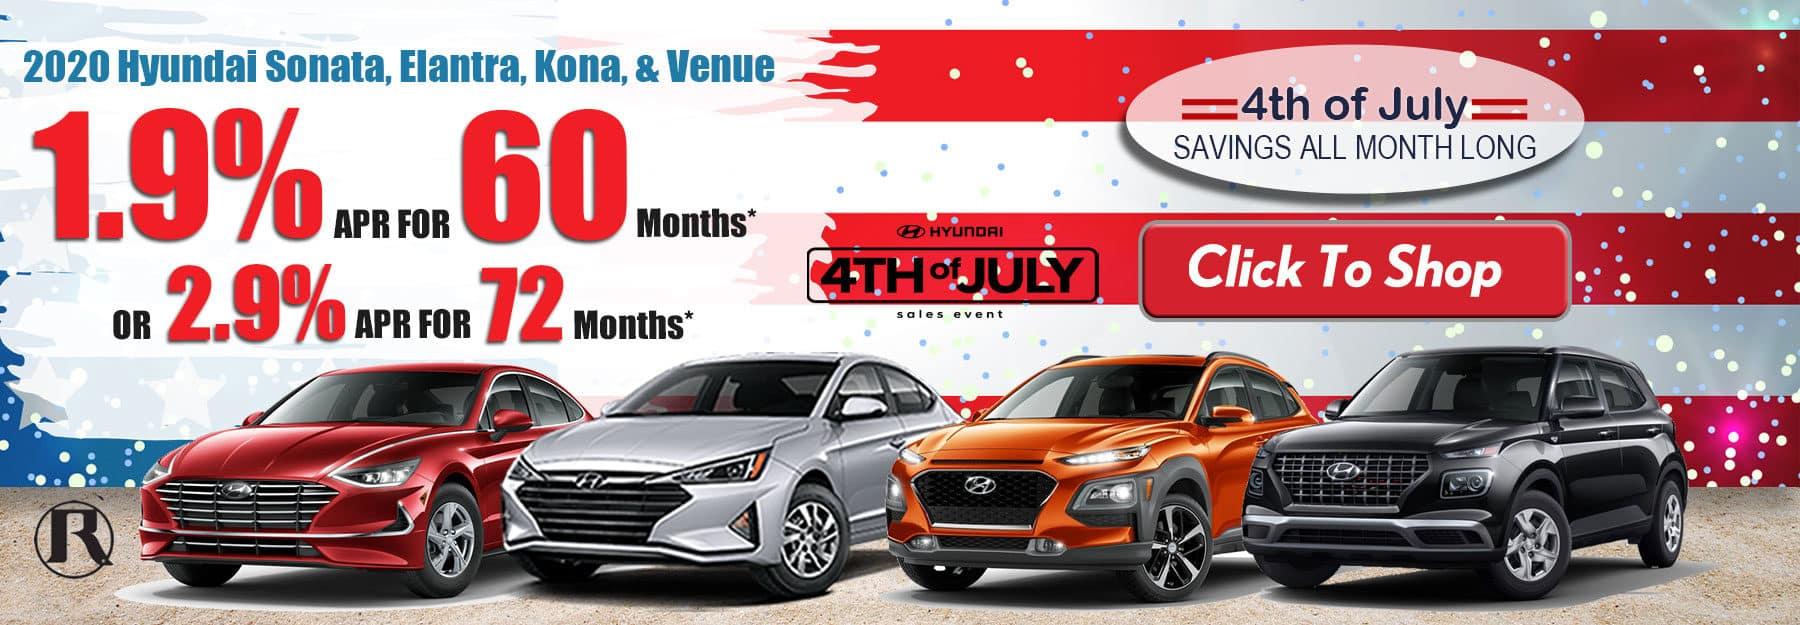 2020 Hyundai Sonata, Elantra, Kona, Venue